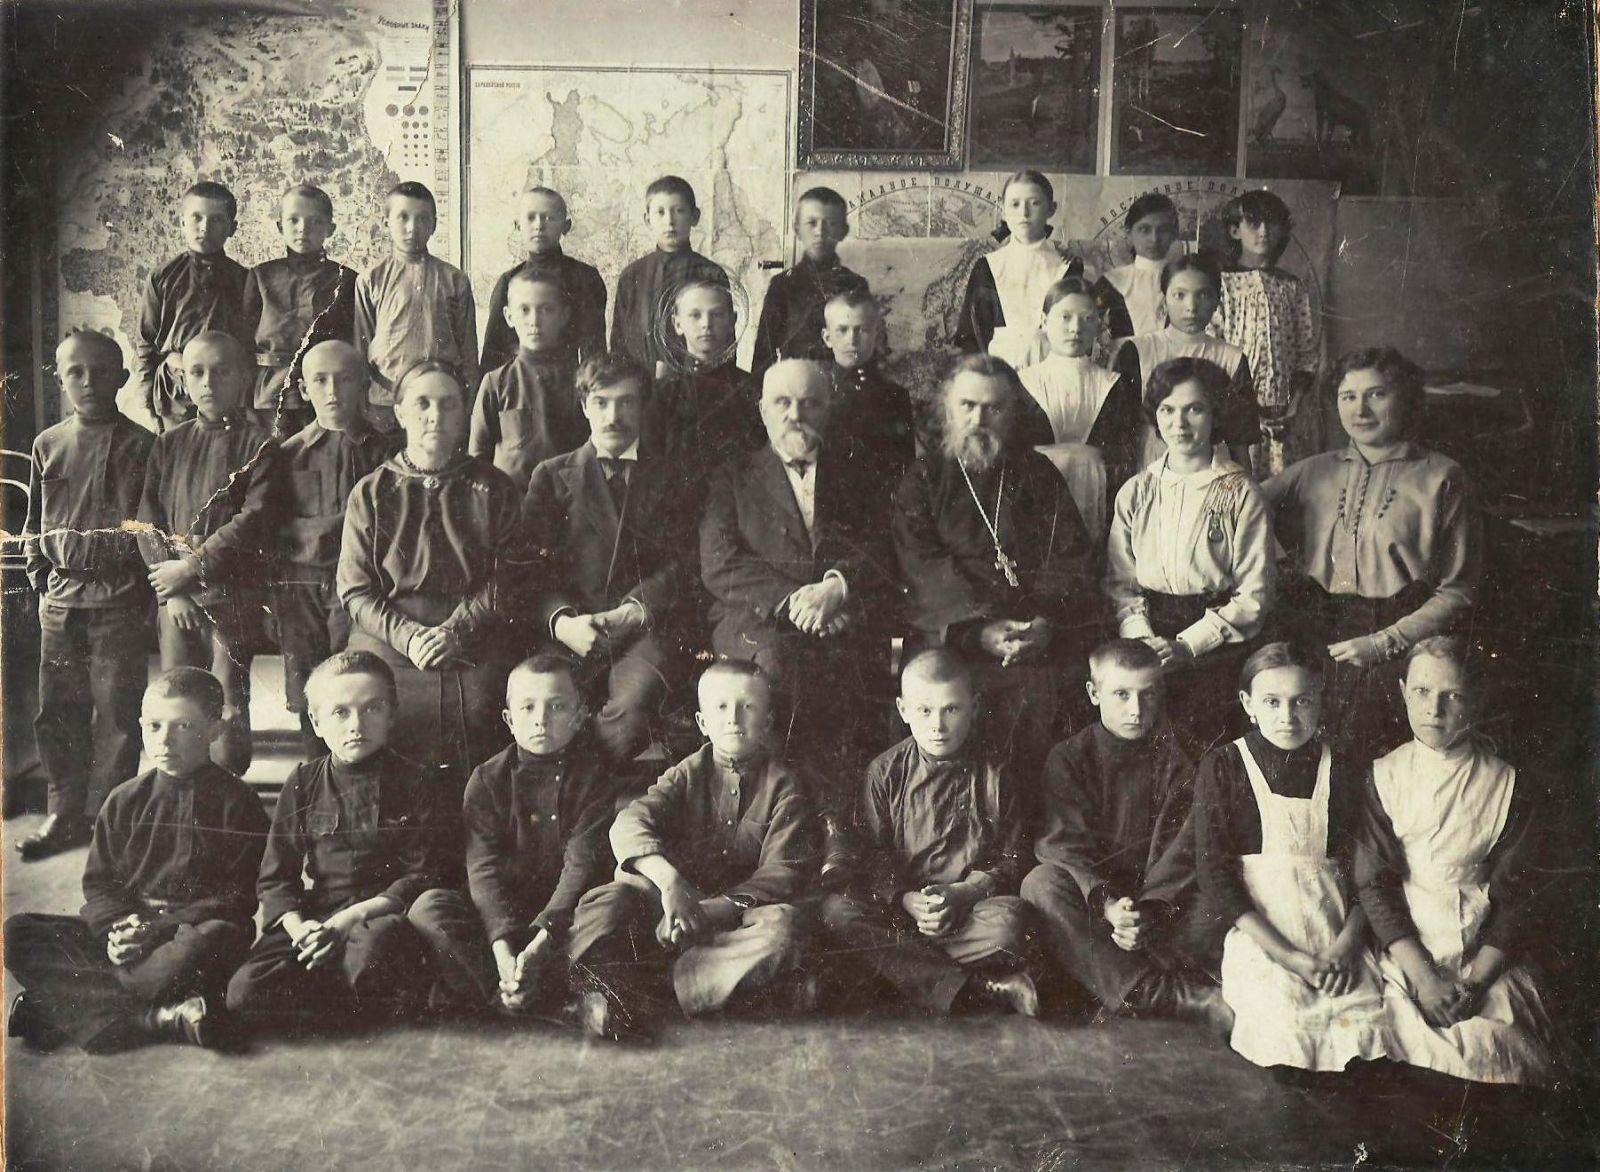 Випуск 30-го парафіяльного училища 1915 року. Павло Кисельов у другому ряду зверху. Обличчя кимось обведене. З особистого архіву Ольги Ромасько